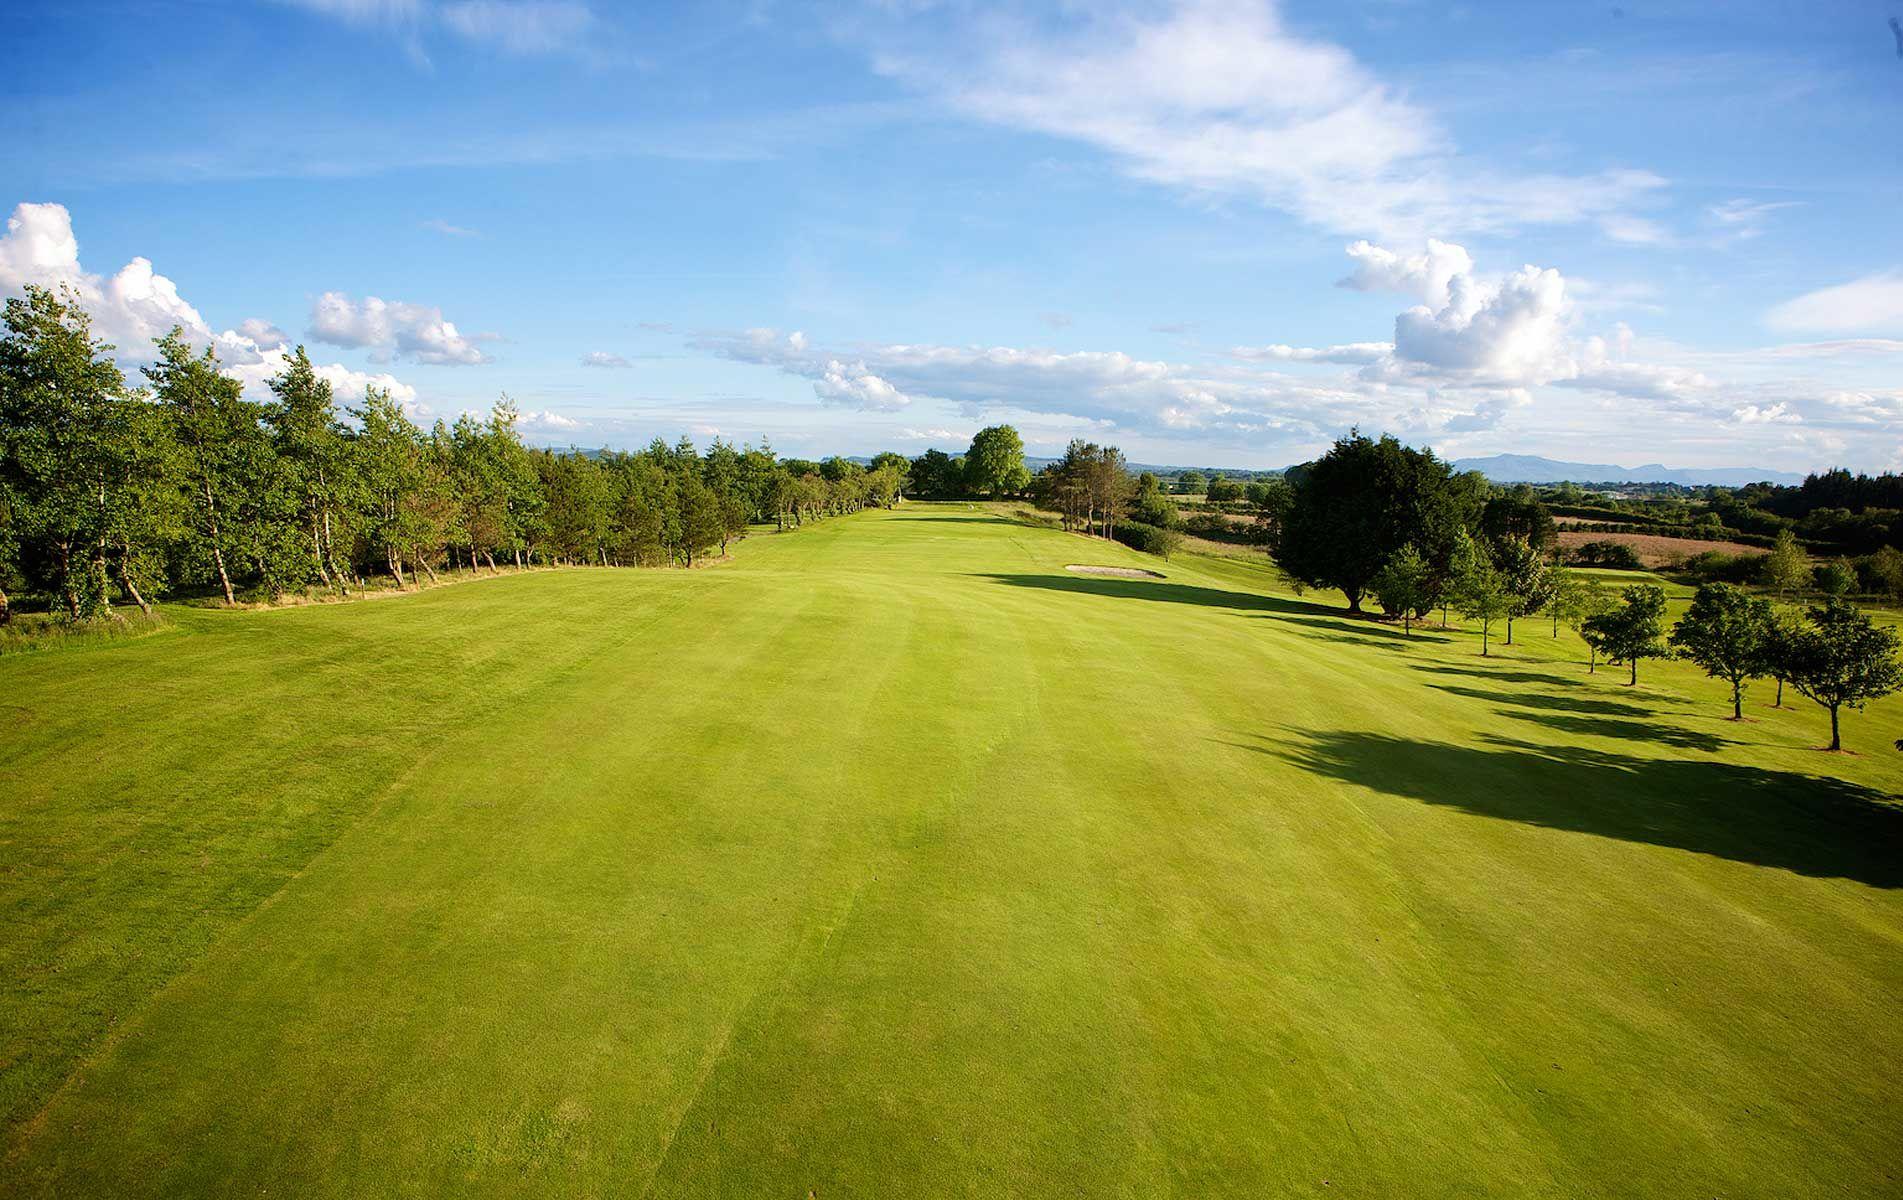 Ballina golf club cover picture